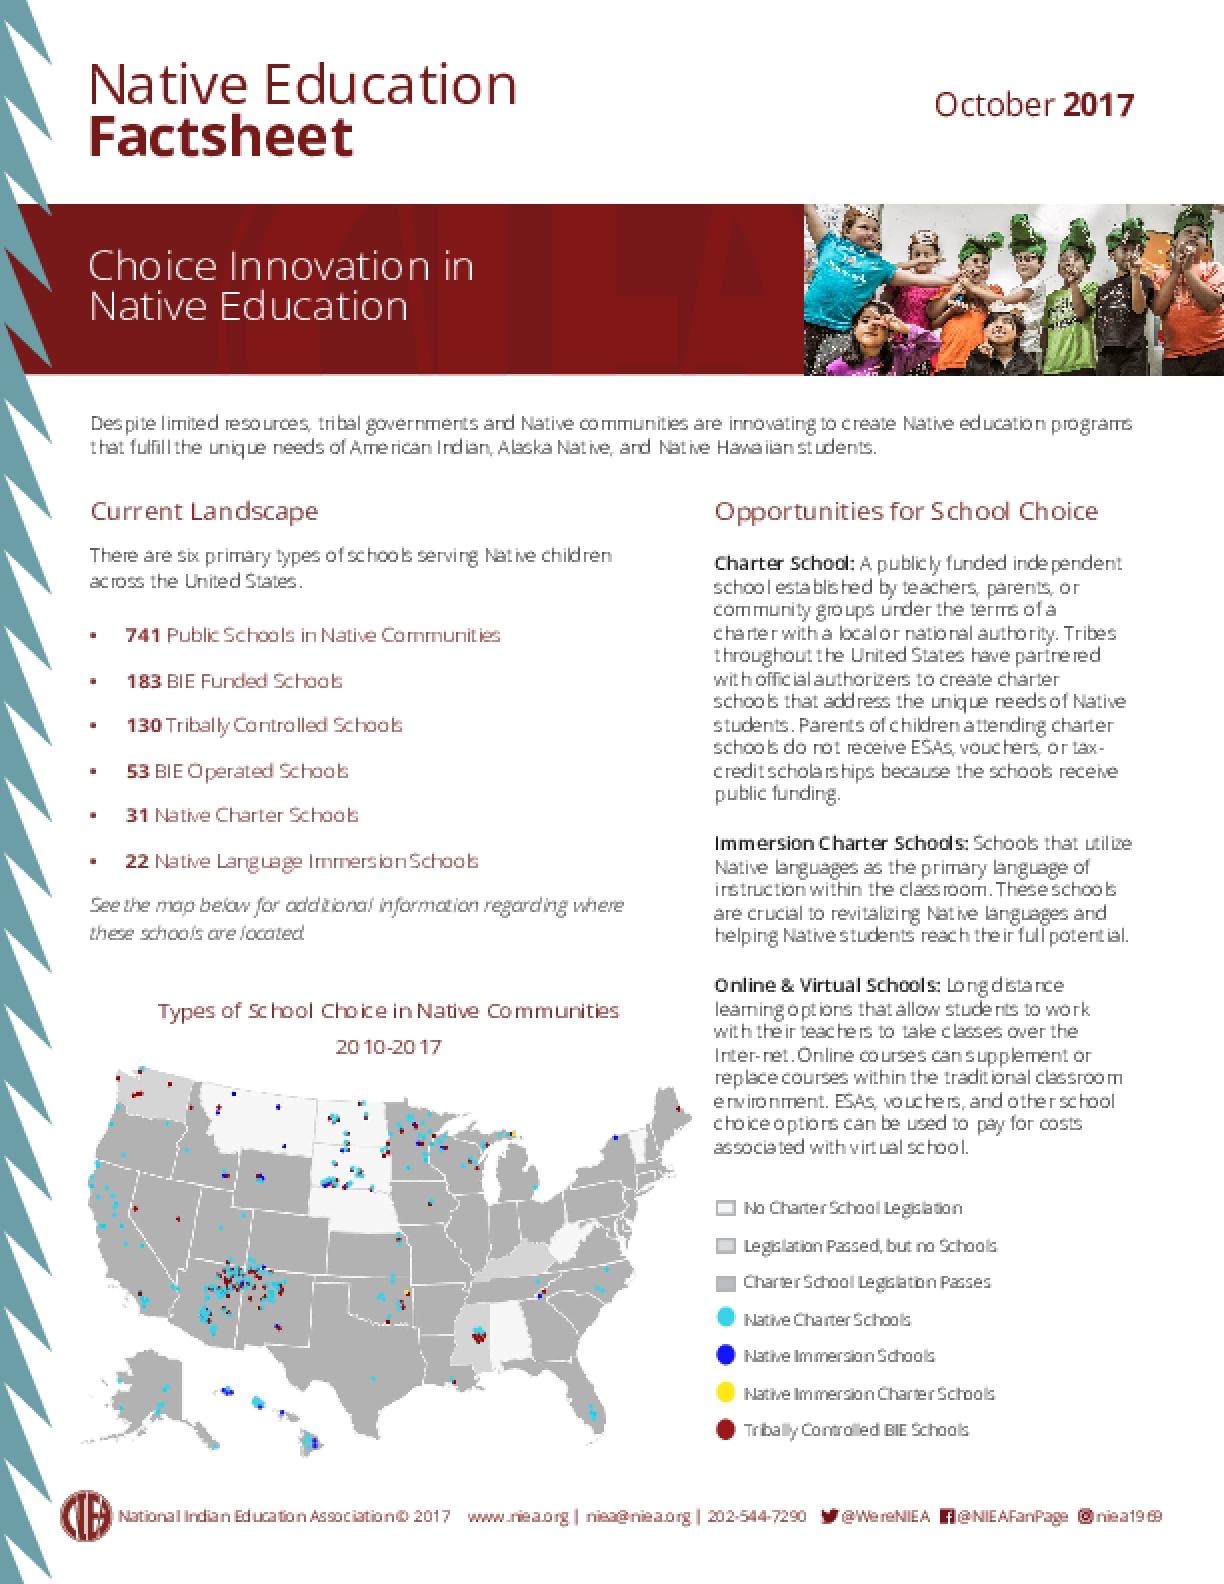 Native Education Factsheet: Choice Innovation in Native Education